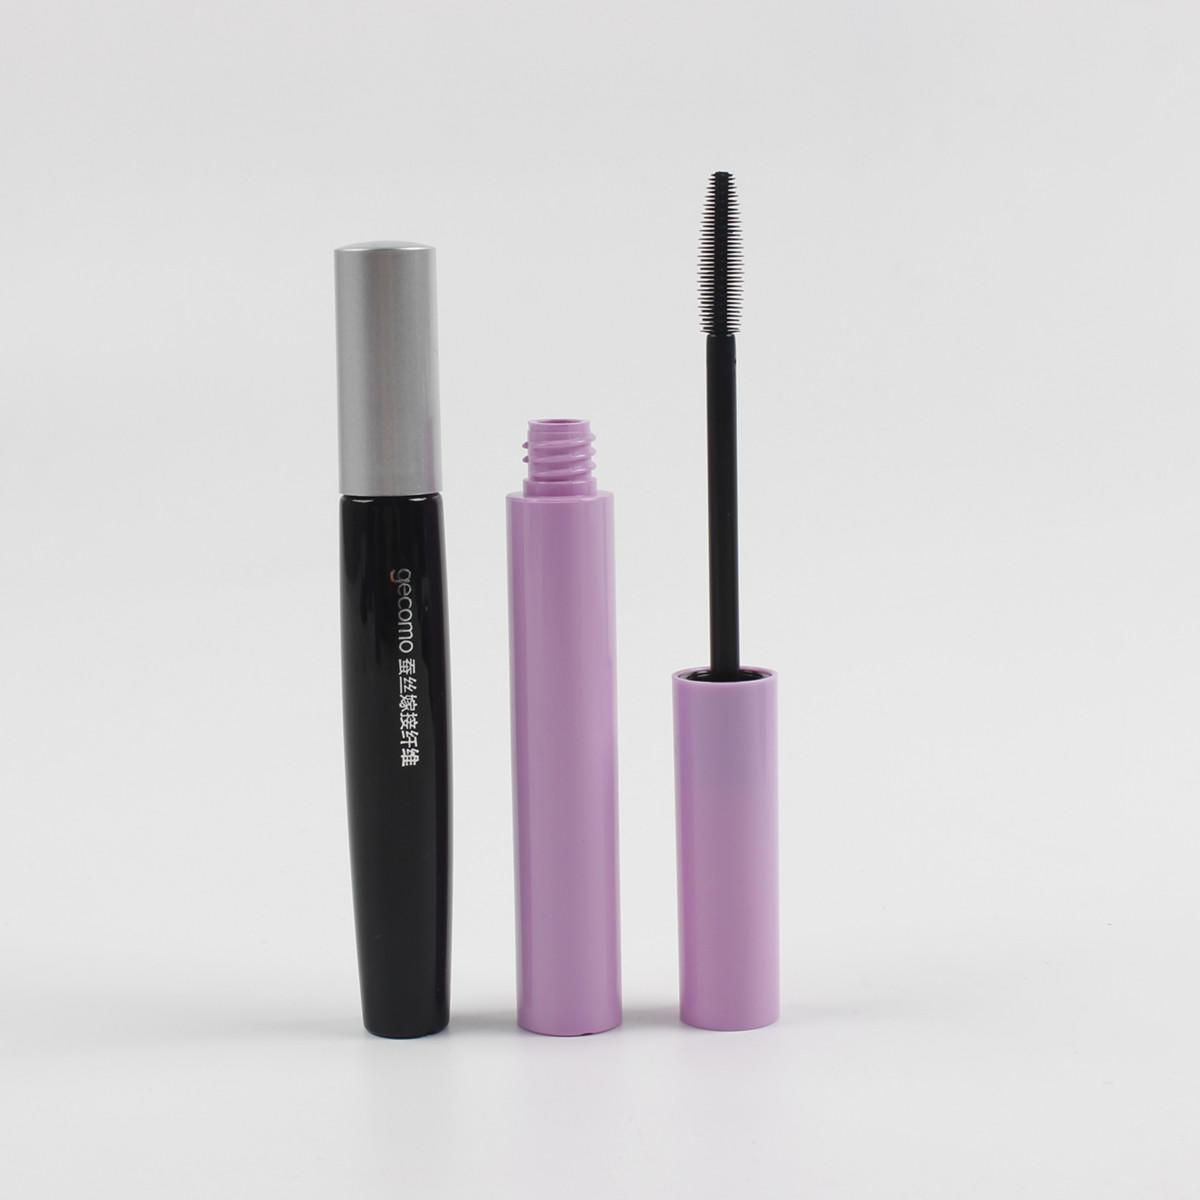 5ml/12ml/Customized Private Label Mascara Wand Tubes Pink Empty Mascara Tube